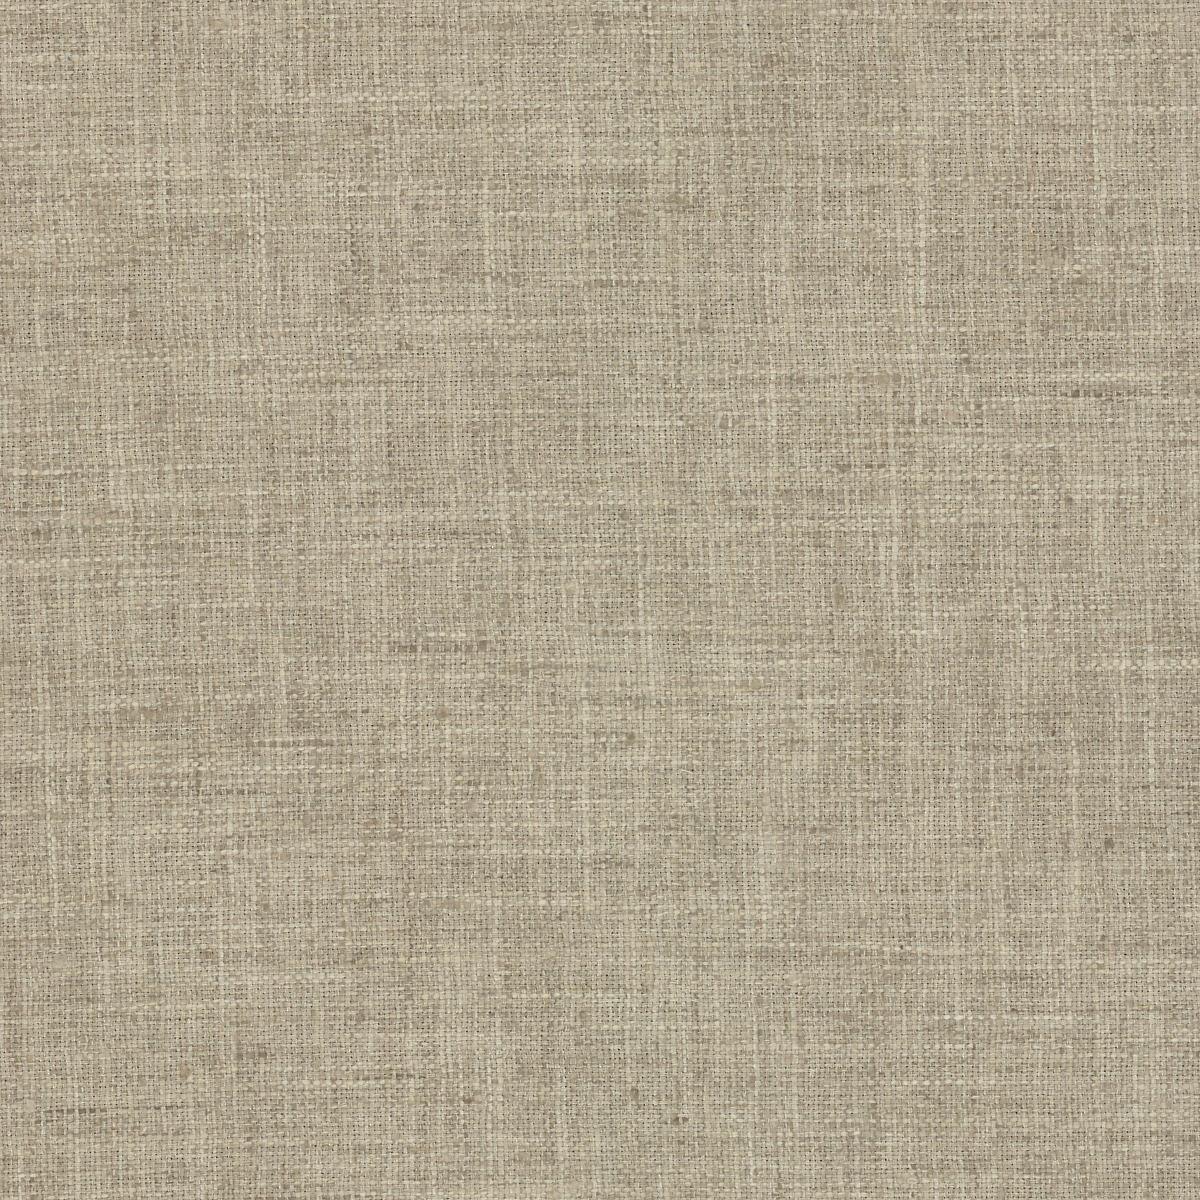 Greylock Grey Indoor/Outdoor Fabric